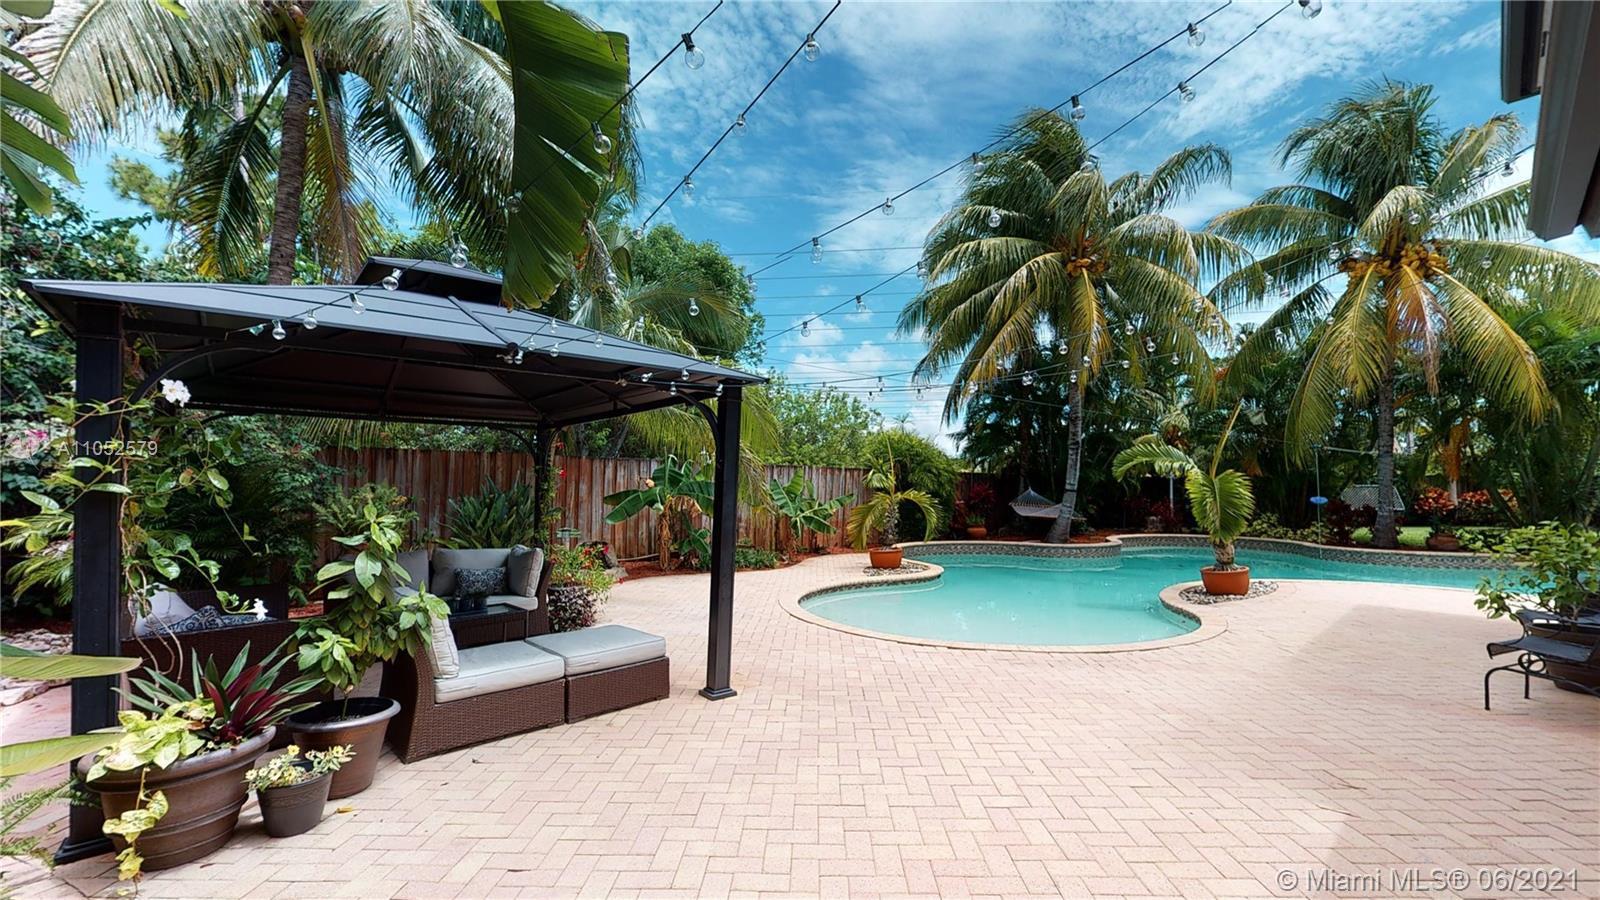 Four Lakes - 13340 SW 122nd Ave, Miami, FL 33186